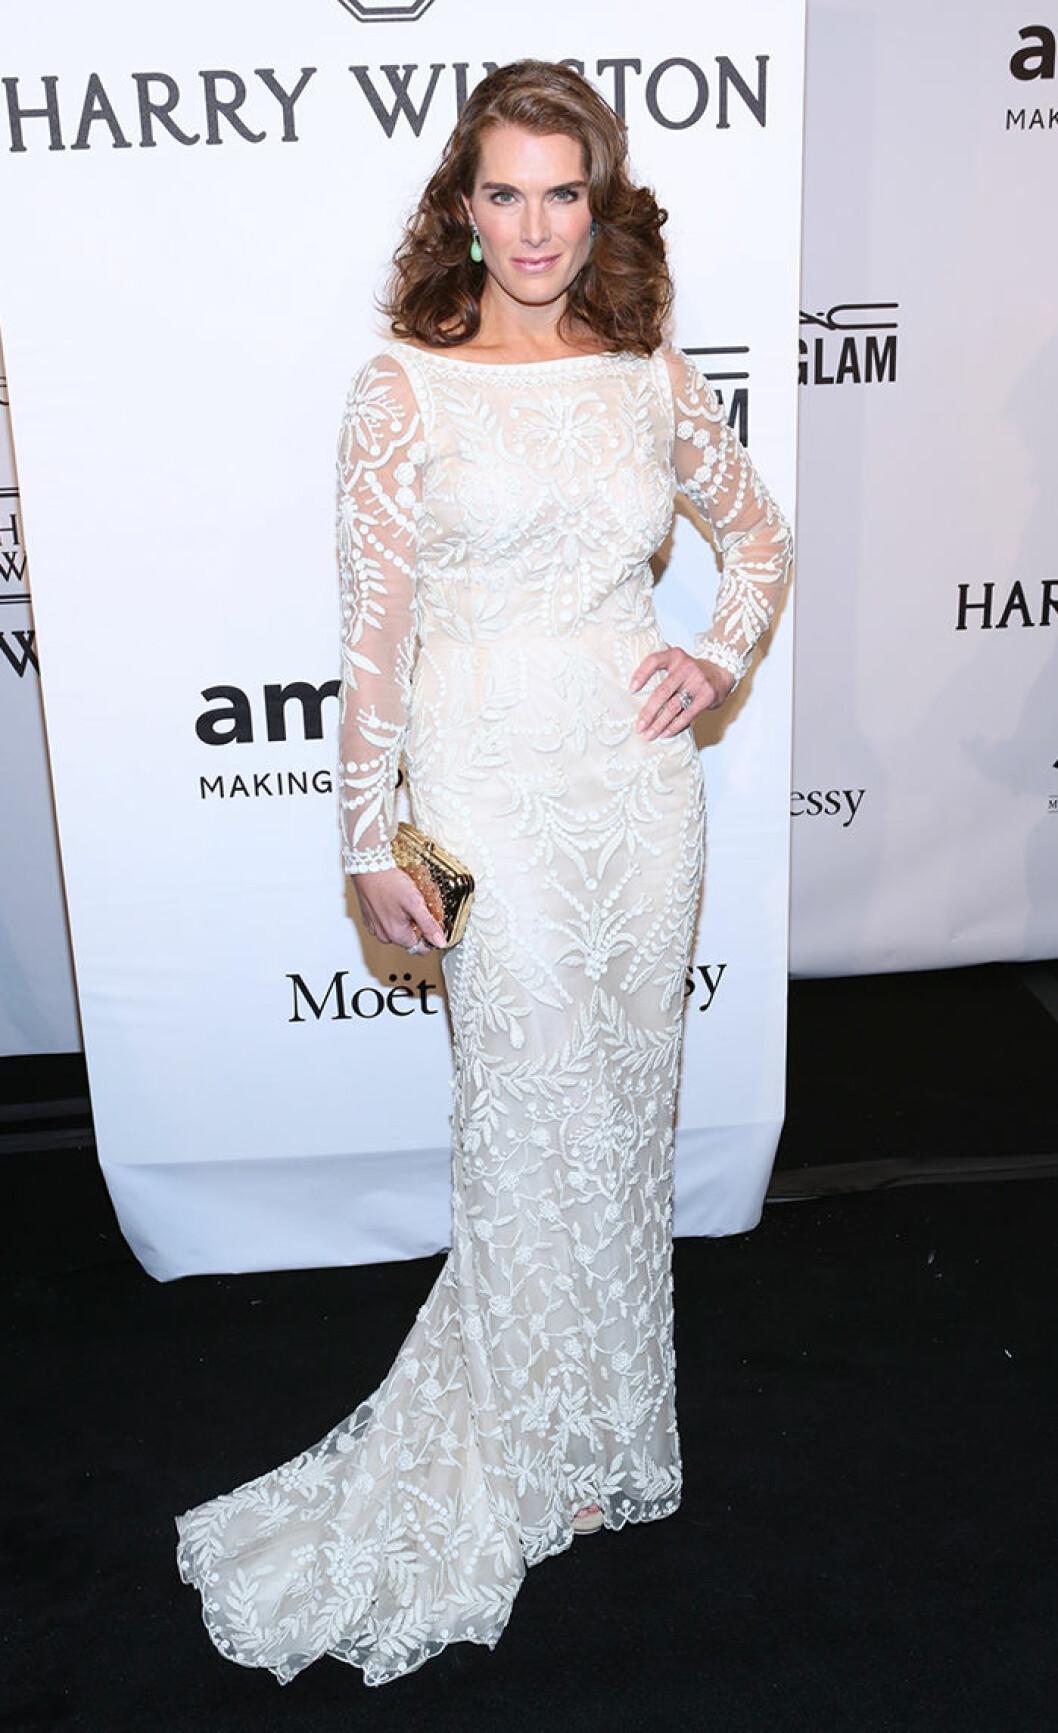 Brooke Shields seen attending the 2015 amfAR New York Gala at Cipriani Wall Street